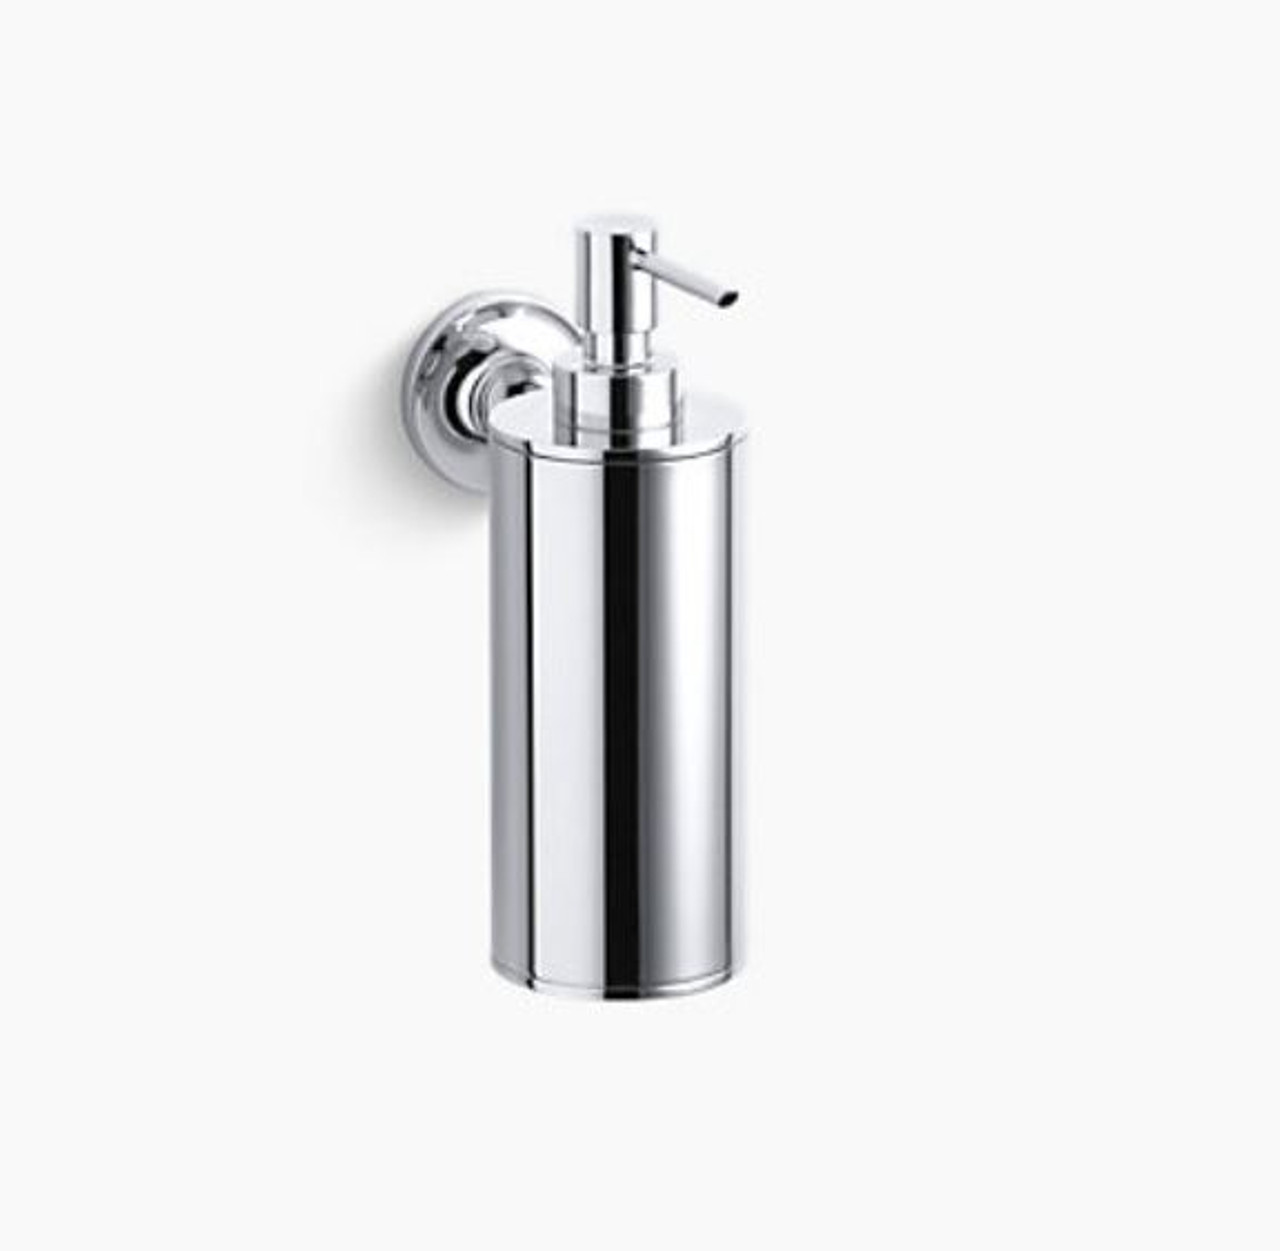 Kohler Purist Wall Mount Soap Lotion Dispenser Polished Chrome